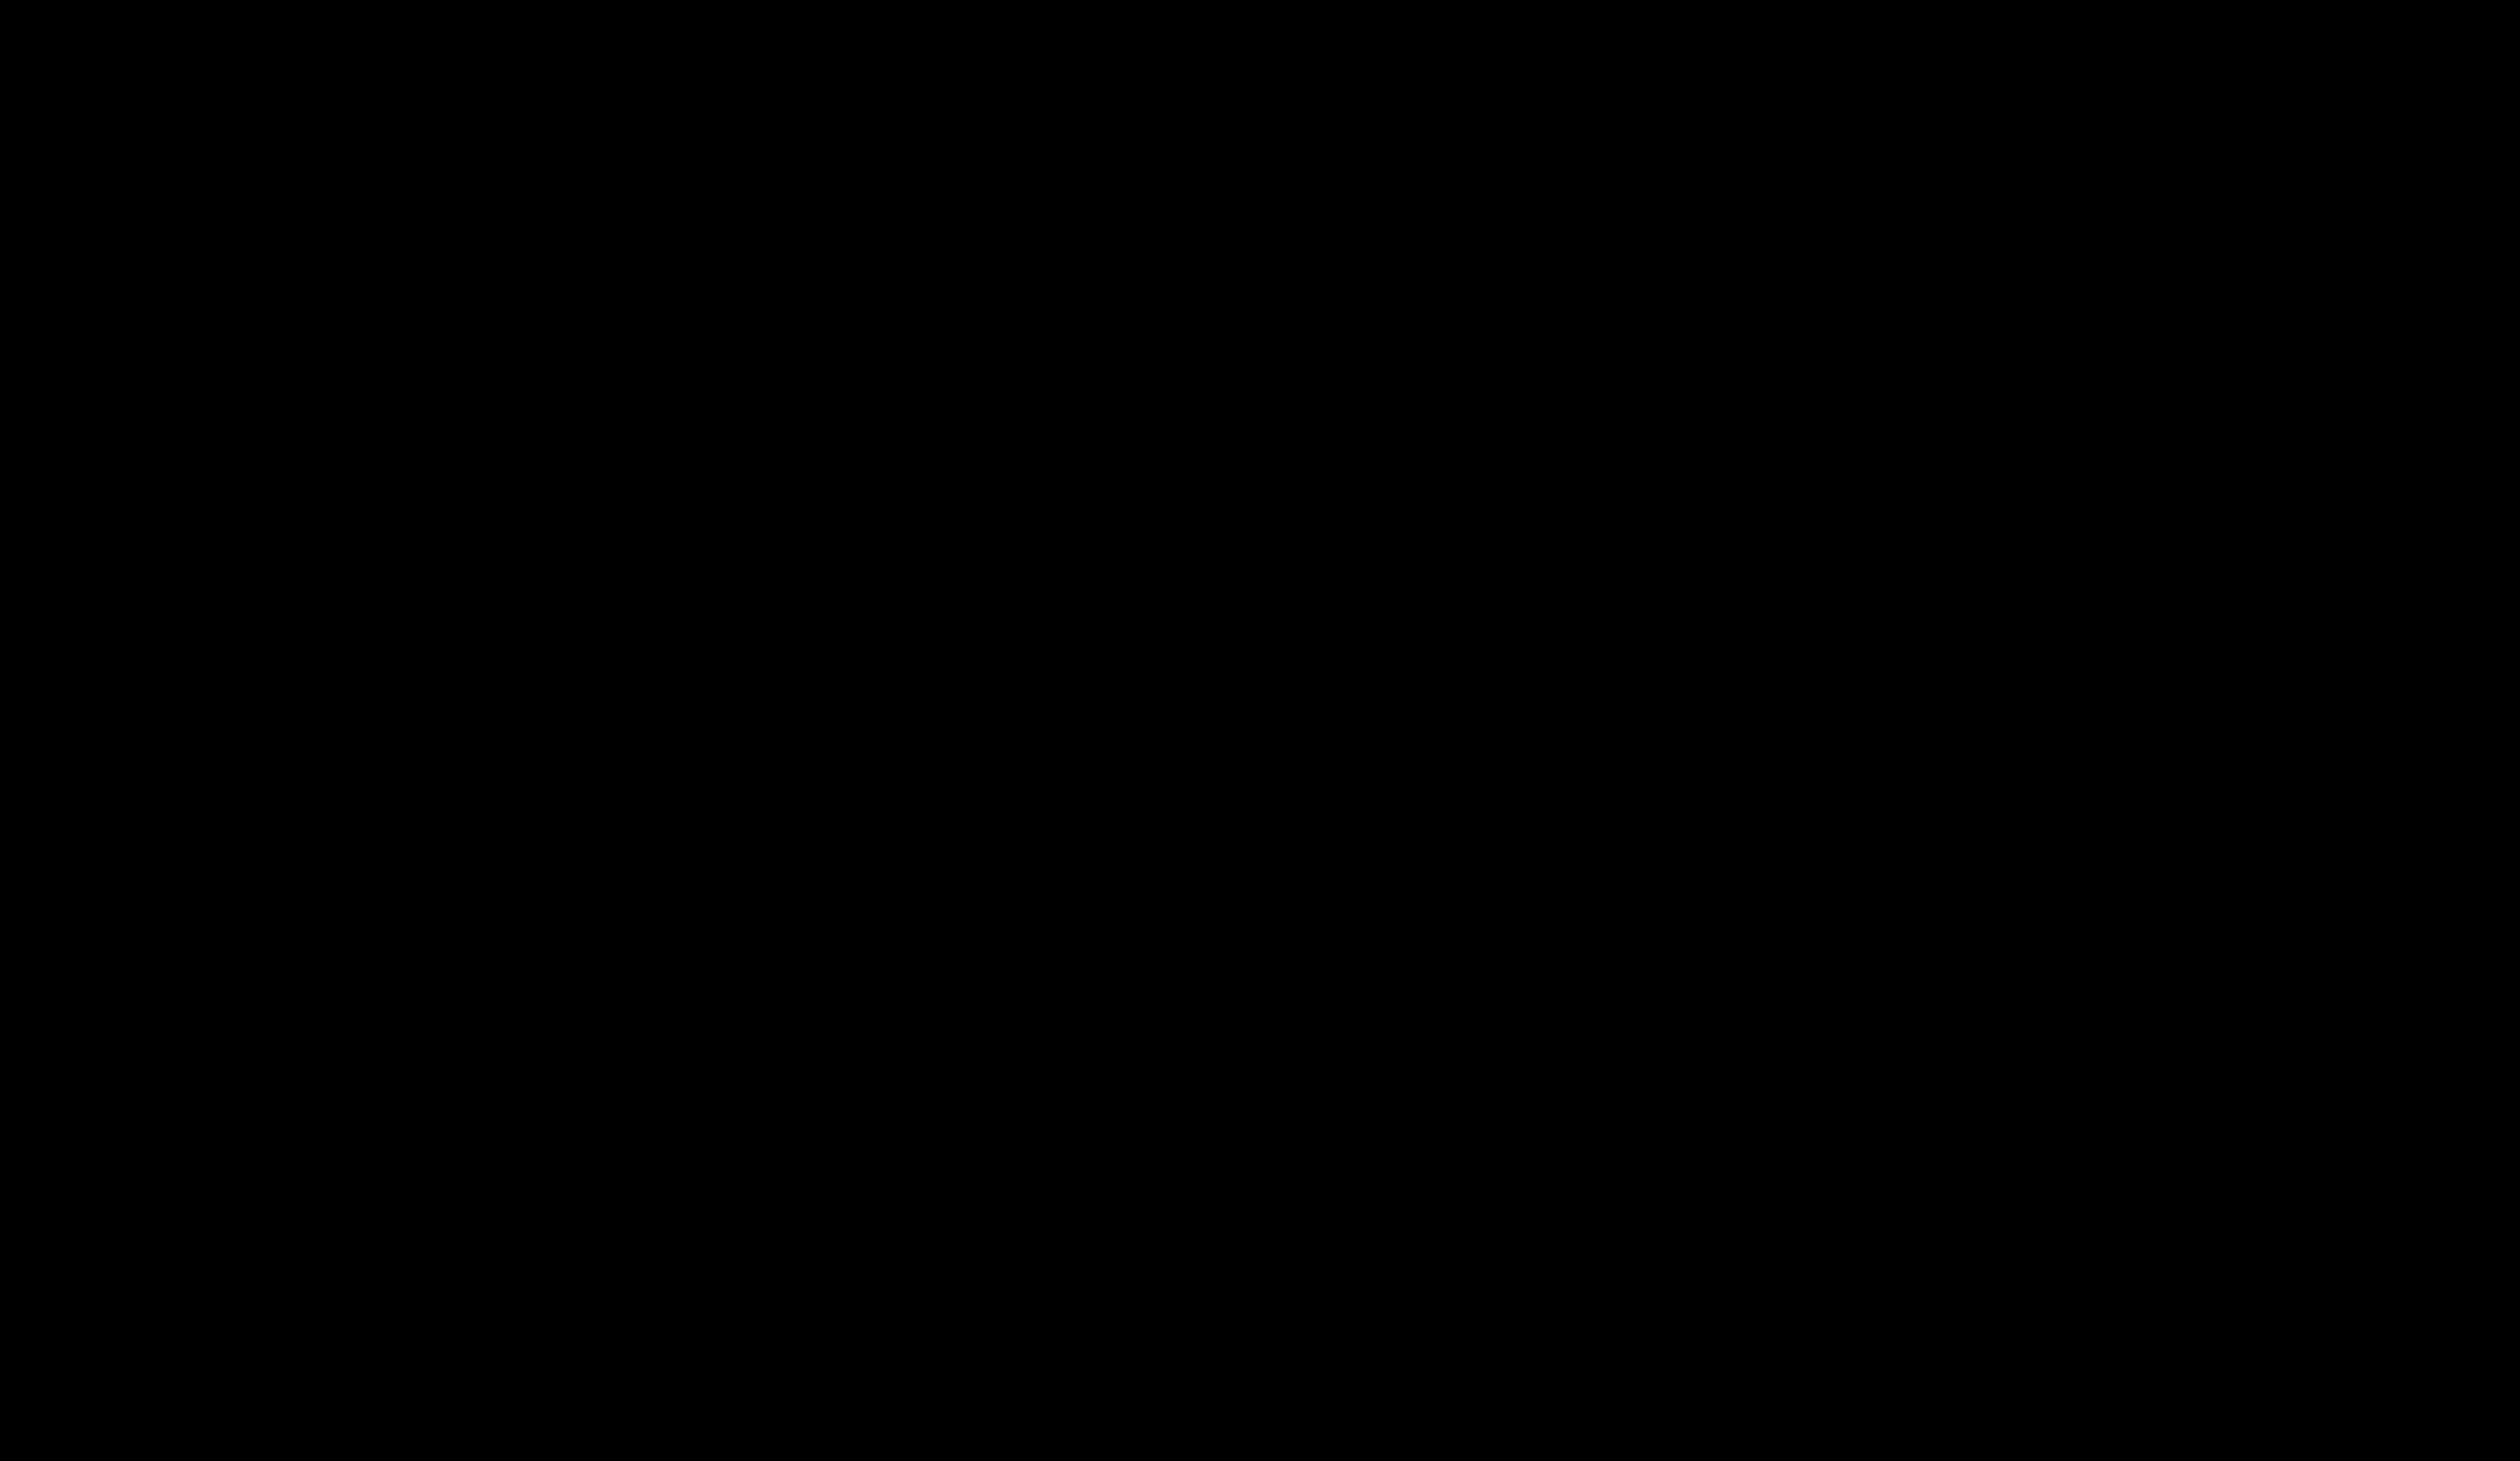 20181214_170129